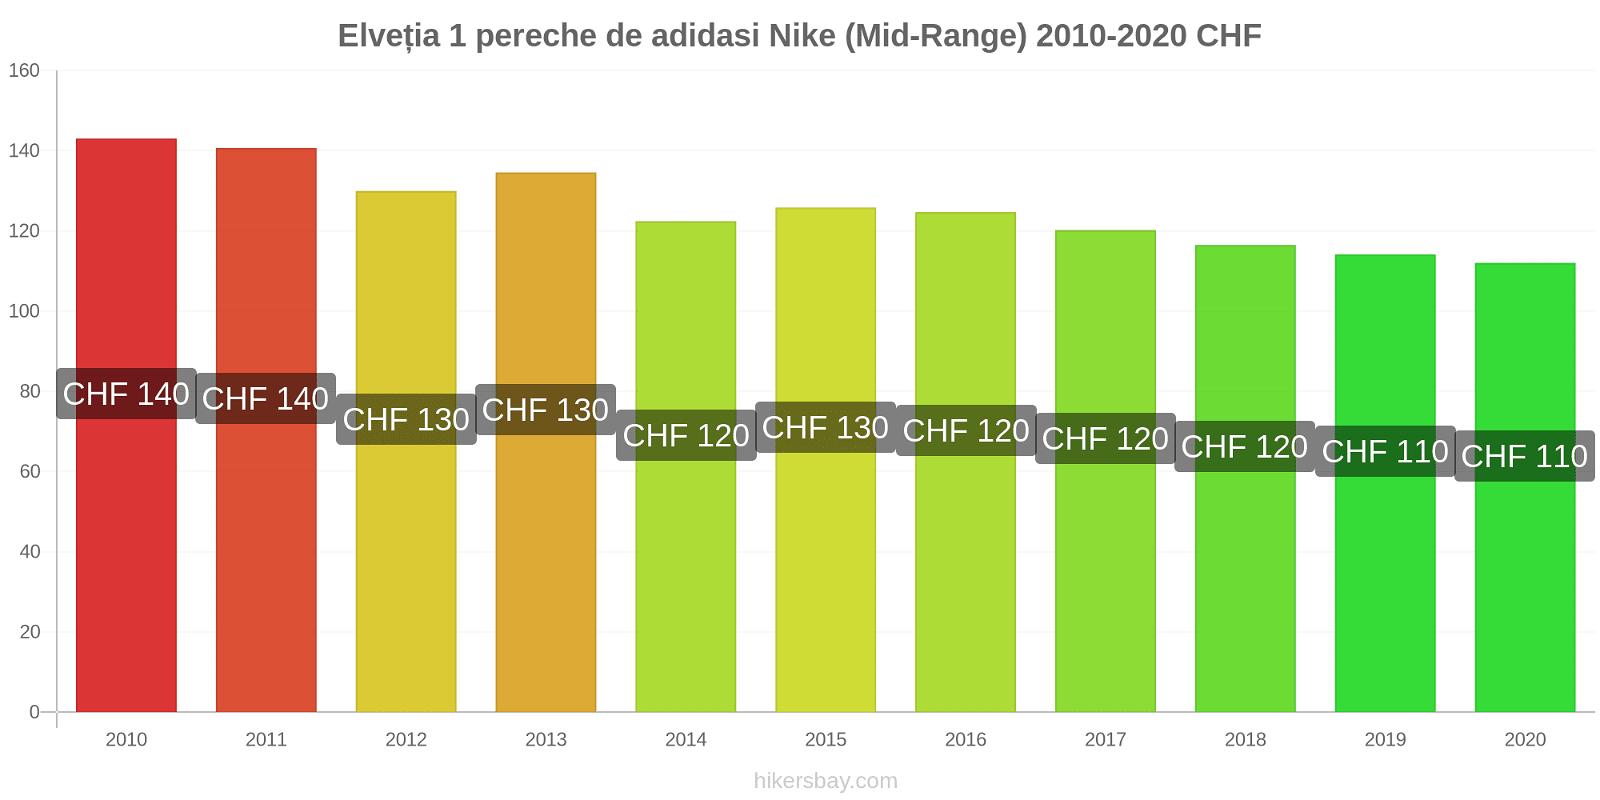 Elveția modificări de preț 1 pereche de adidasi Nike (Mid-Range) hikersbay.com